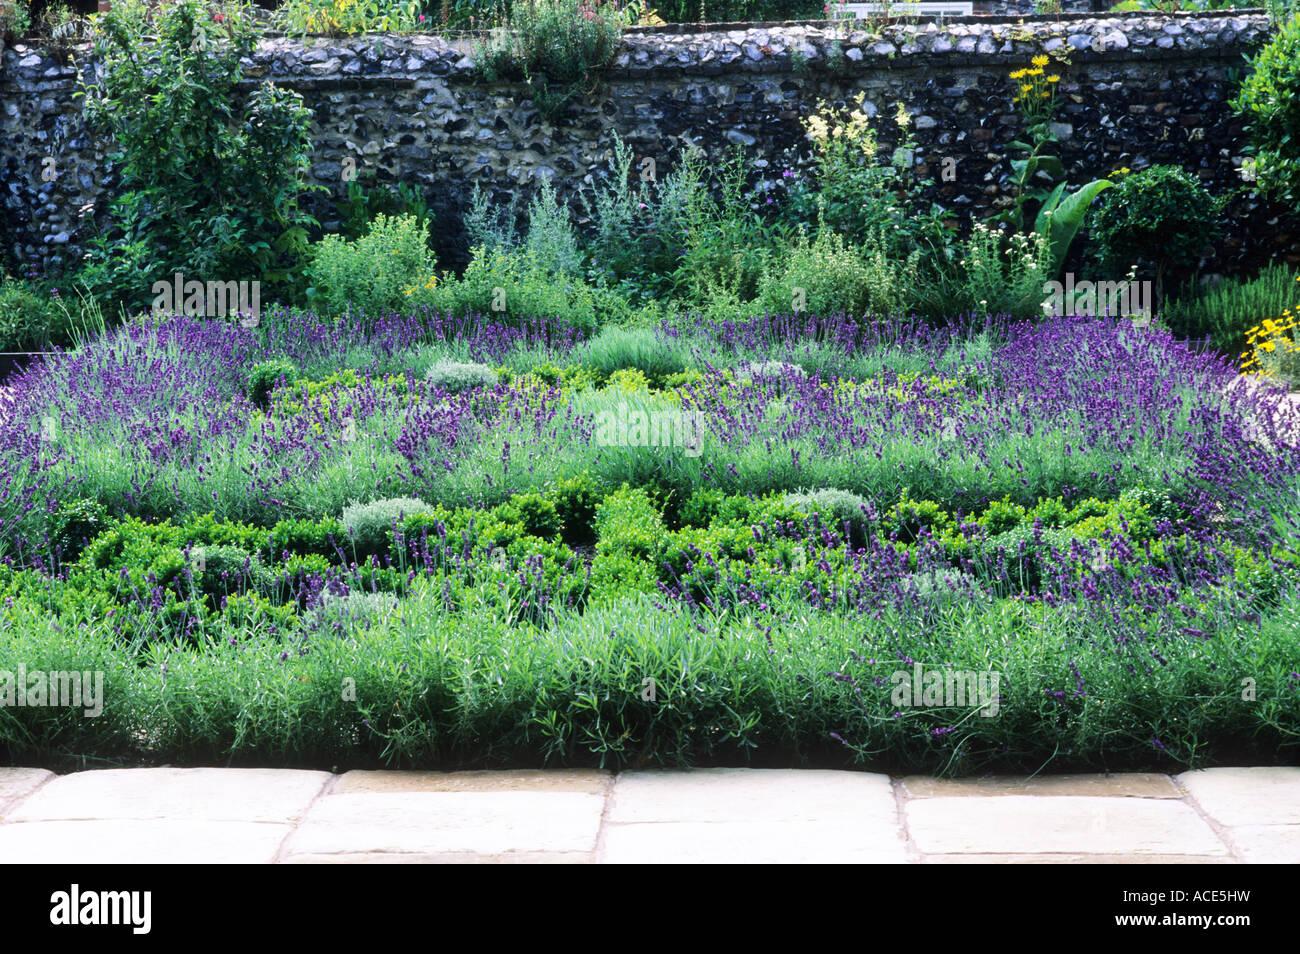 Herb knot garden lavender box hedges gardens herbs hedge for Herb knot garden designs